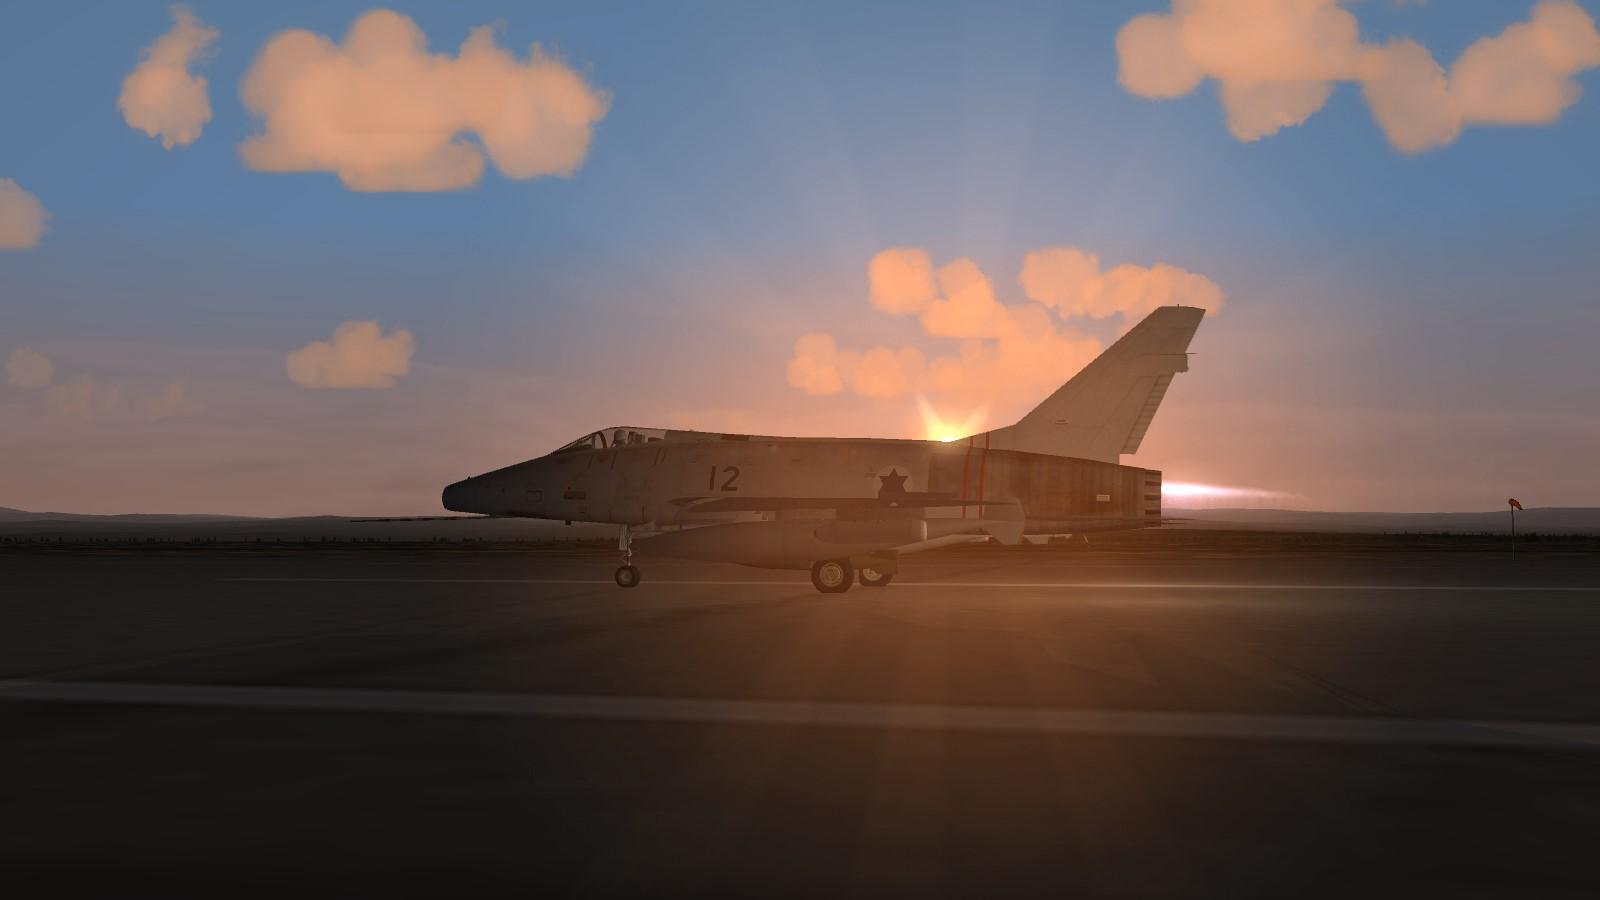 IAF F-100C